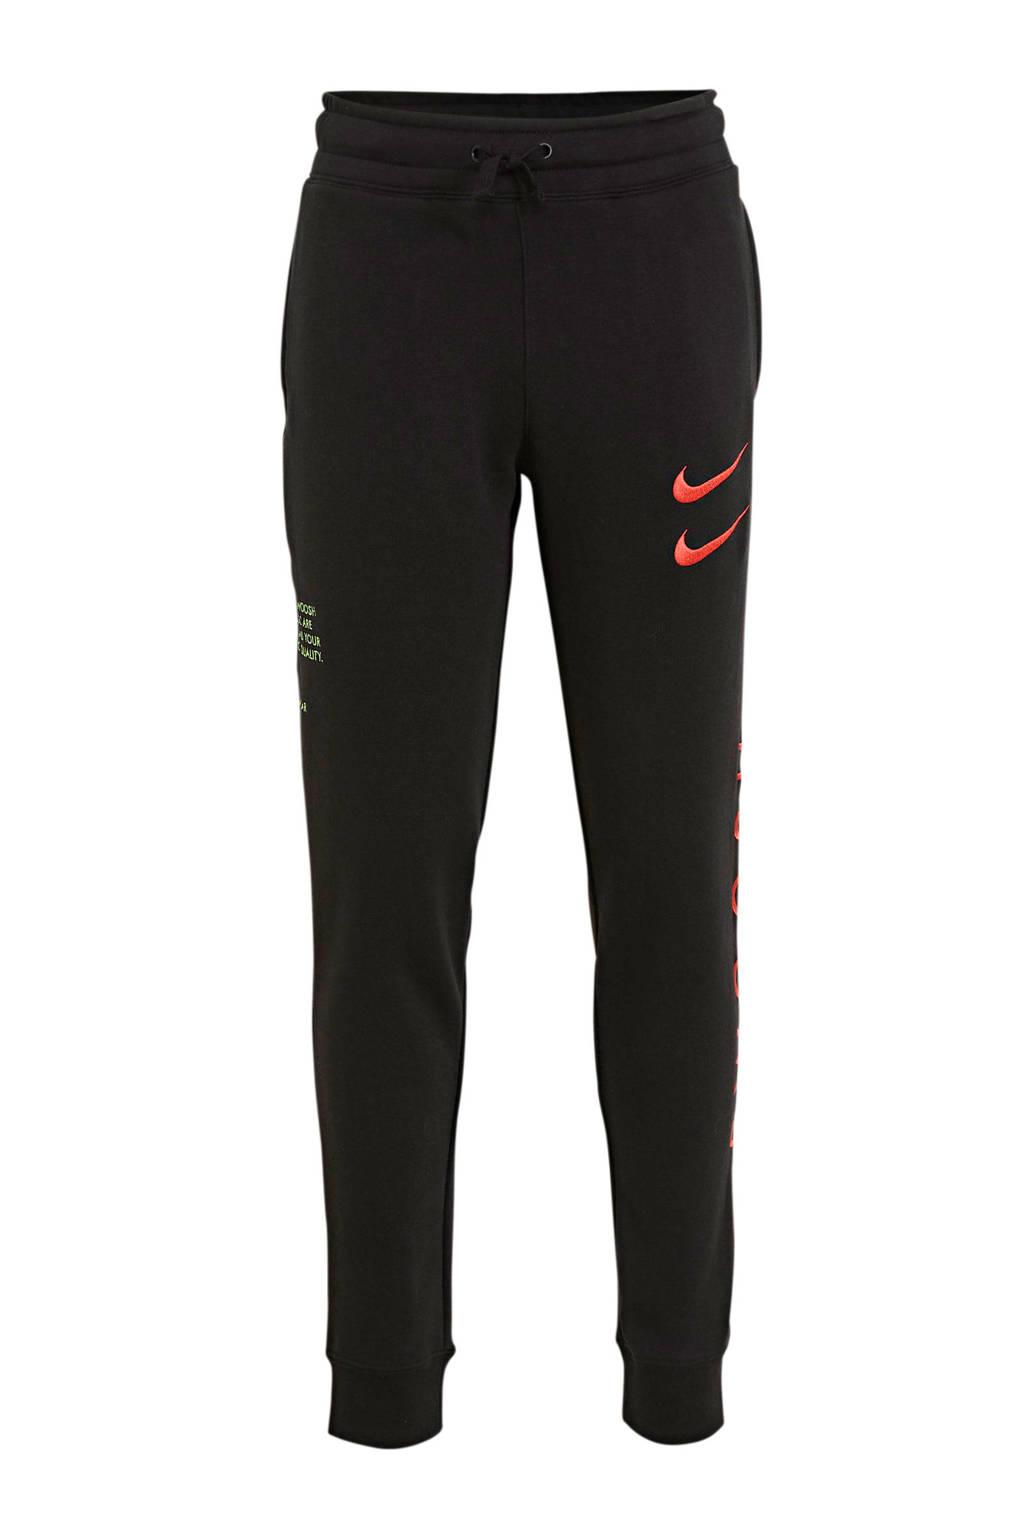 Nike joggingbroek zwart/roze, Zwart/roze